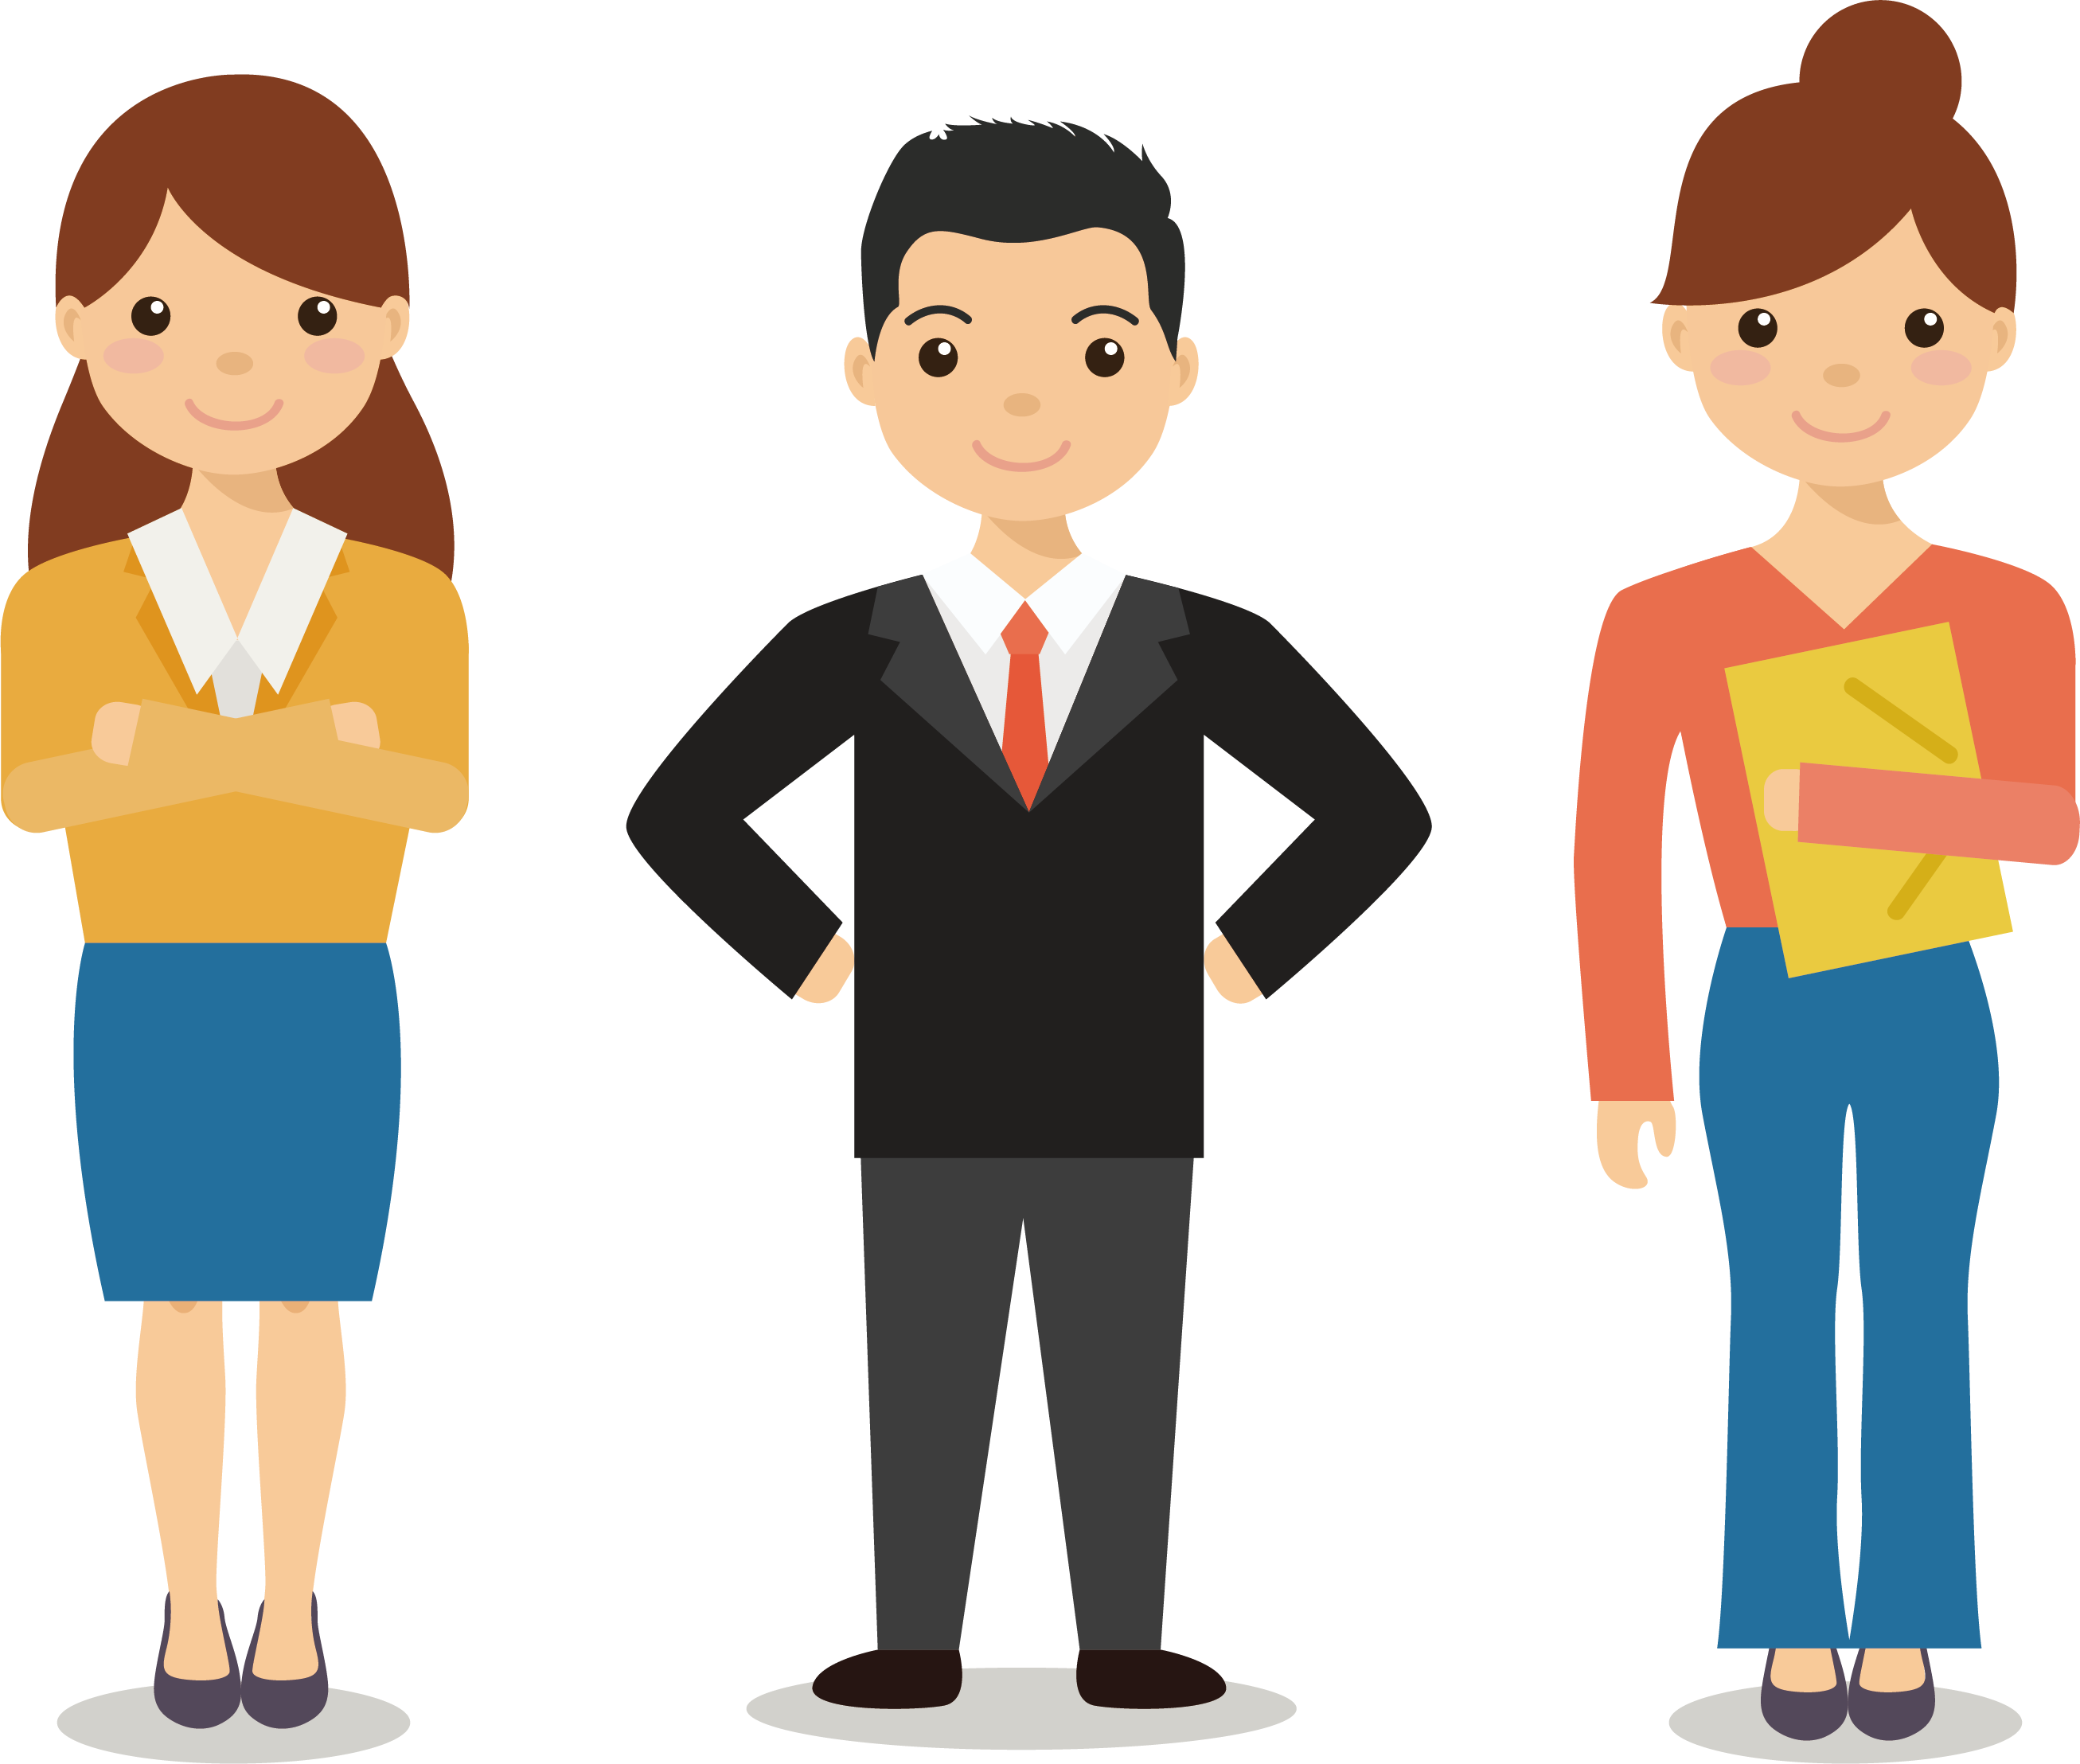 Professional clipart business relationship. Mobile app development sales